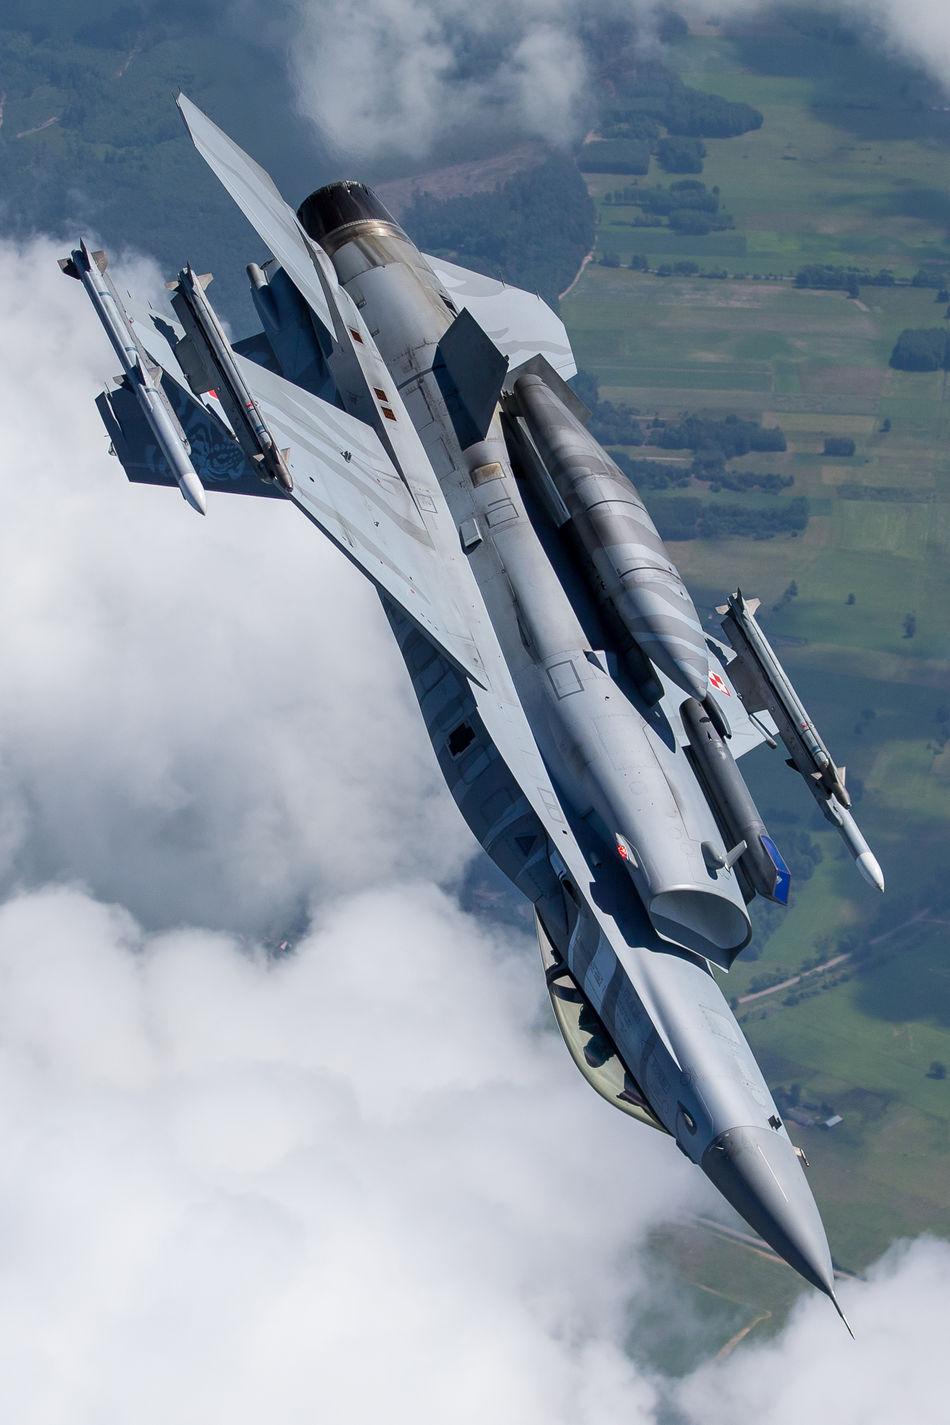 Beautiful stock photos of militär, sky, airplane, cloud - sky, flying